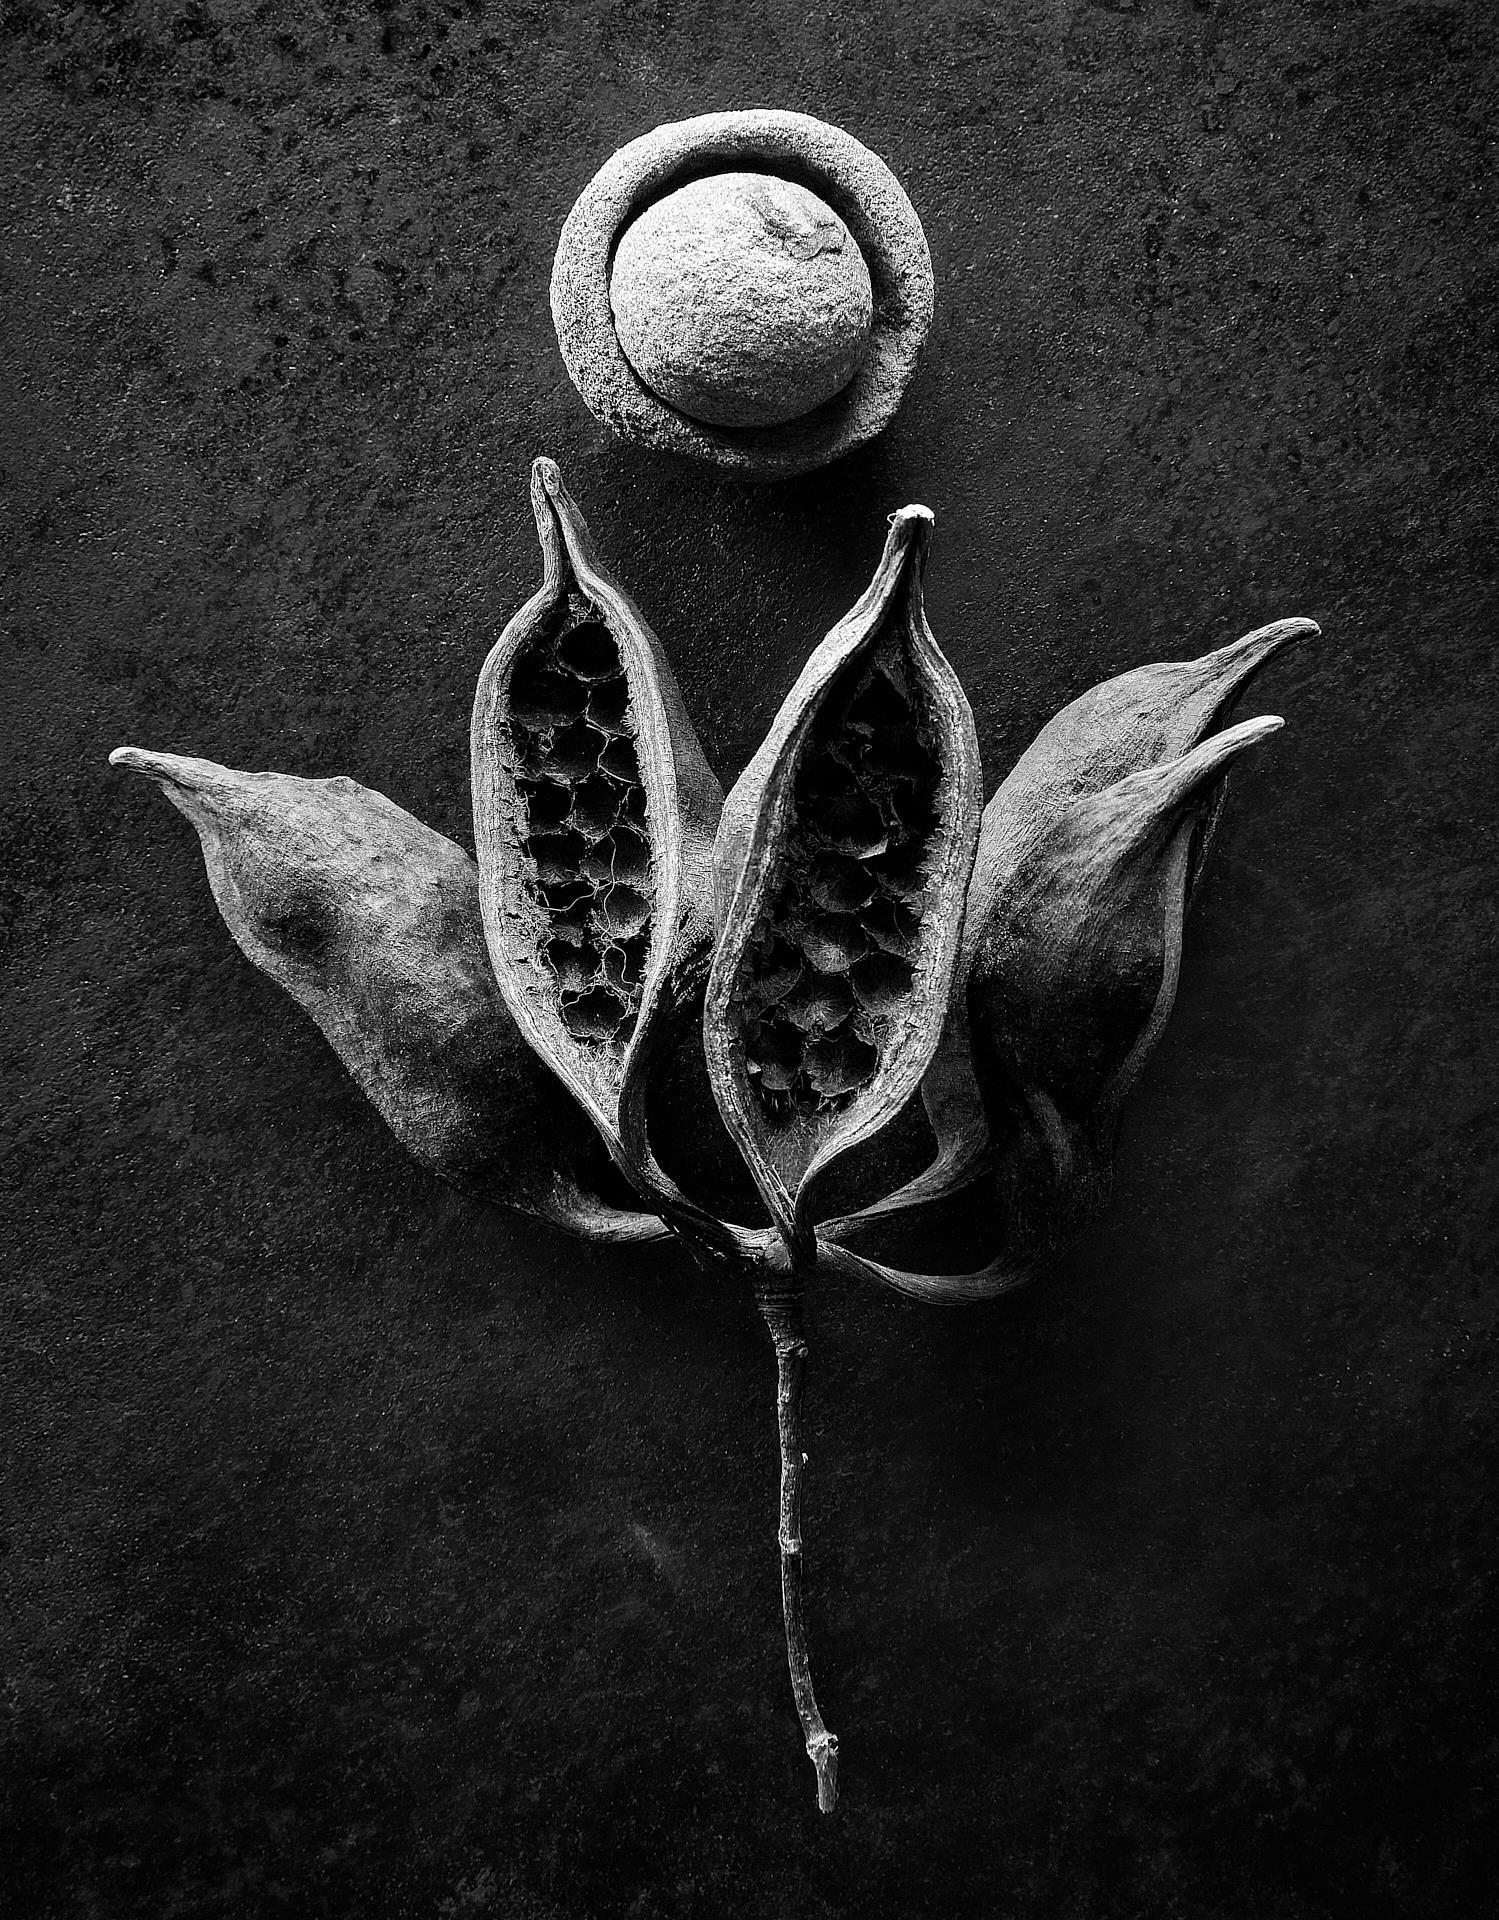 © David Moore